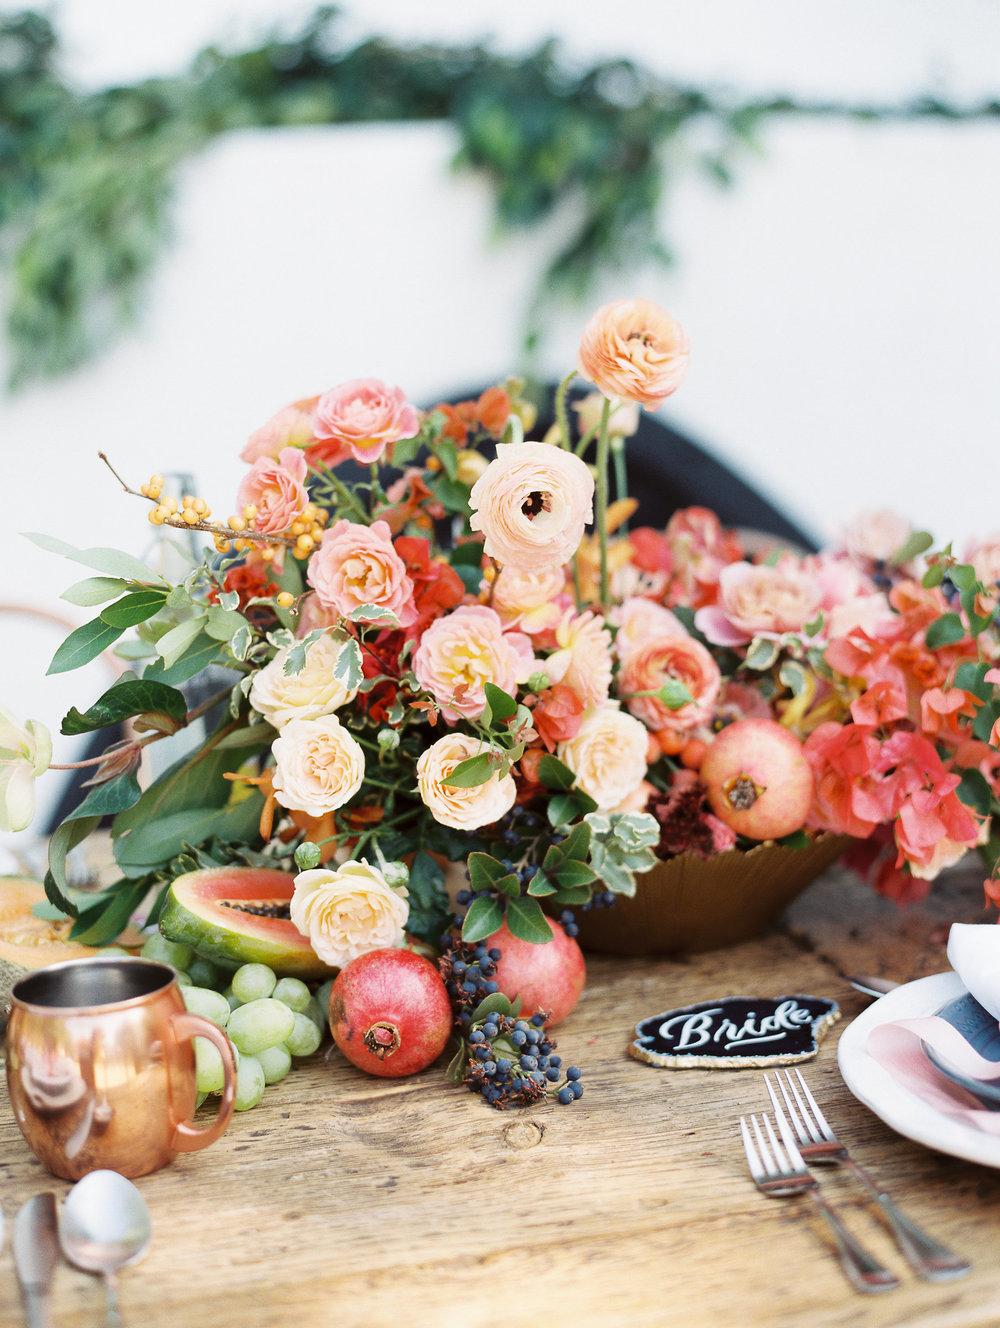 Traditional Wedding With A Modern Twist In Greece Flower Arrangement